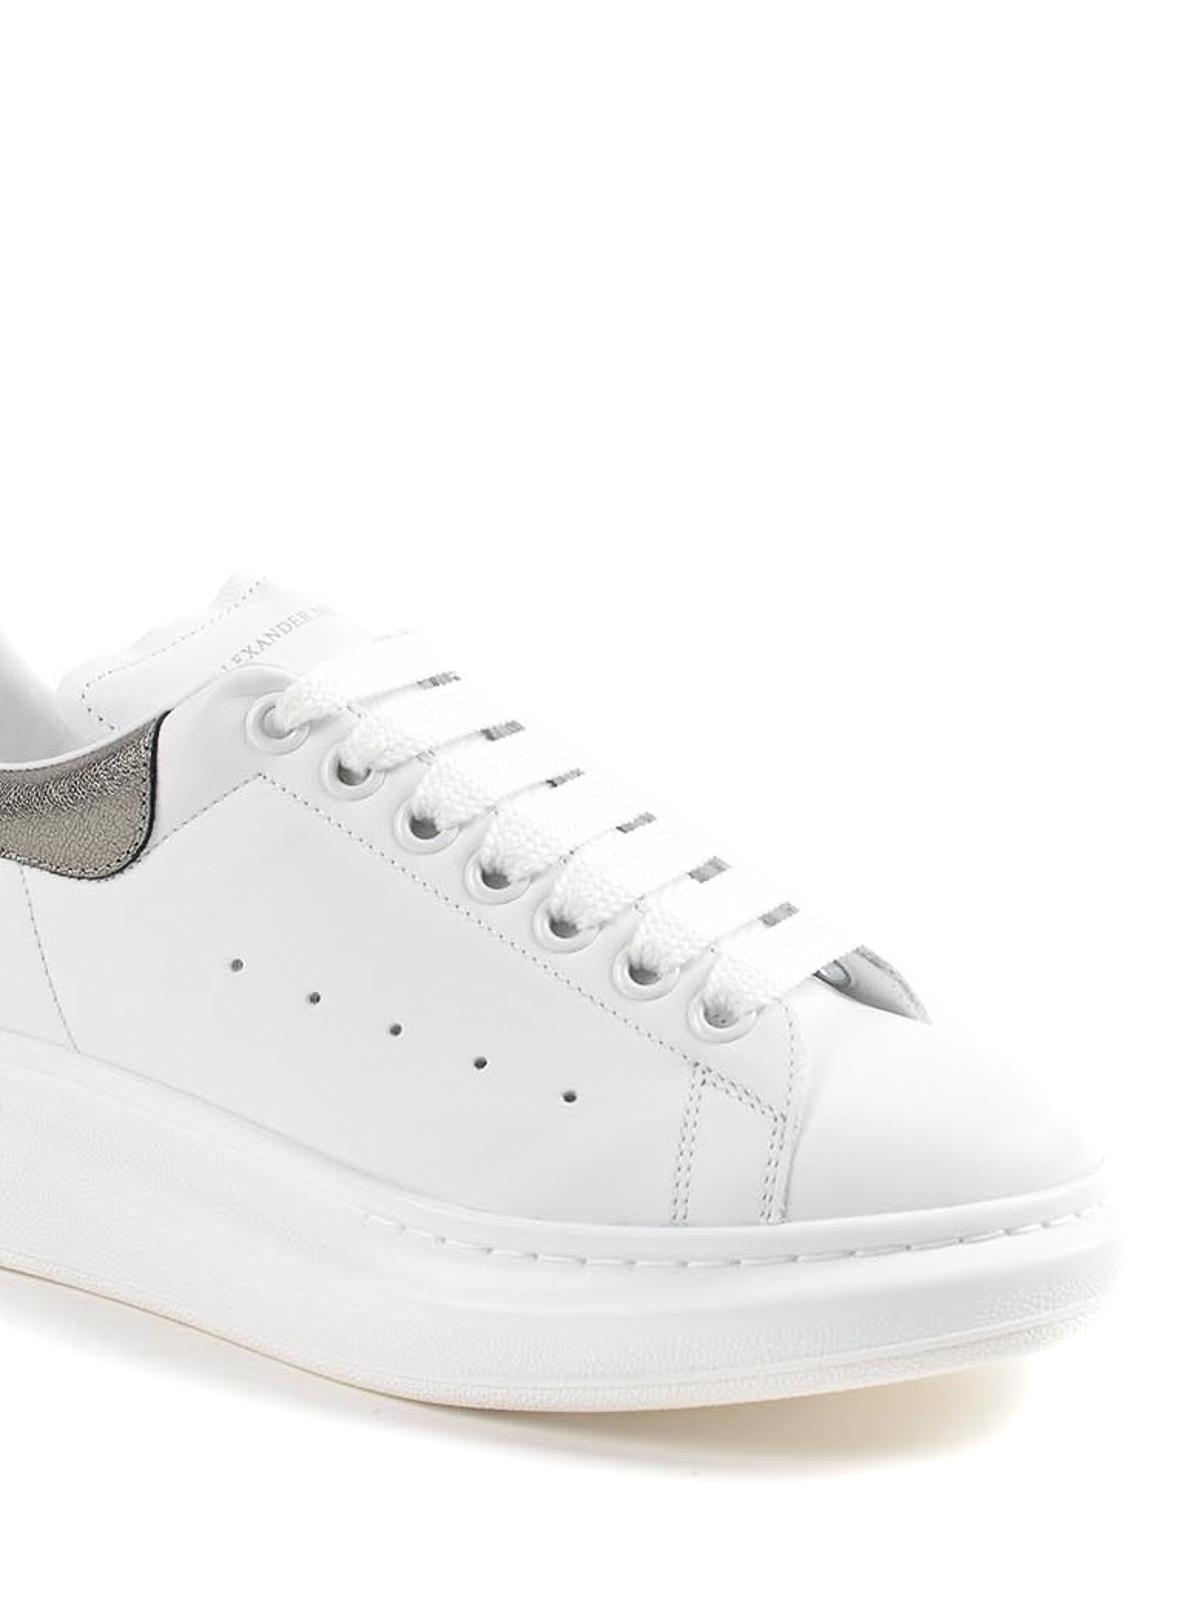 Sneakers Mcqueen Alexander In 9042 376814whfbu Sneaker Pelle BrQWxodCe